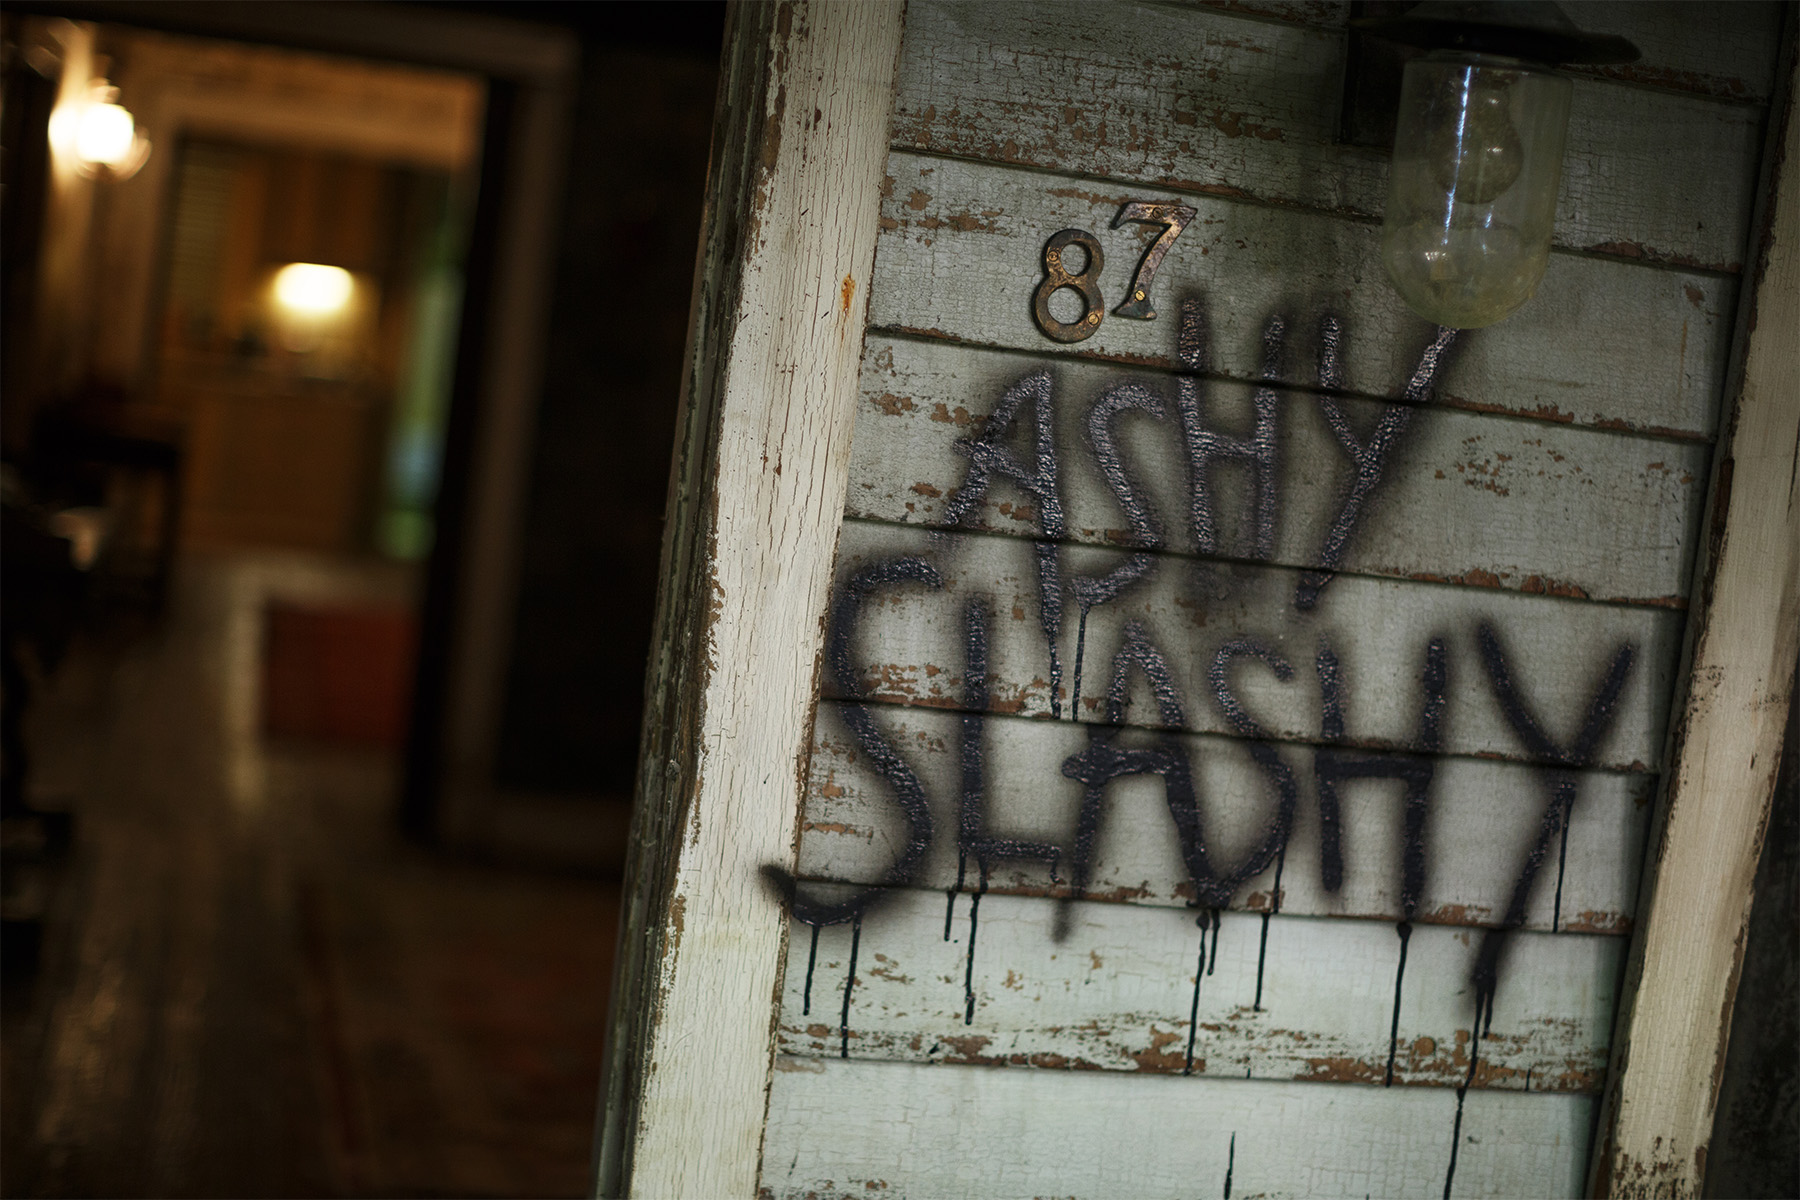 Ashy+Slashy.jpg